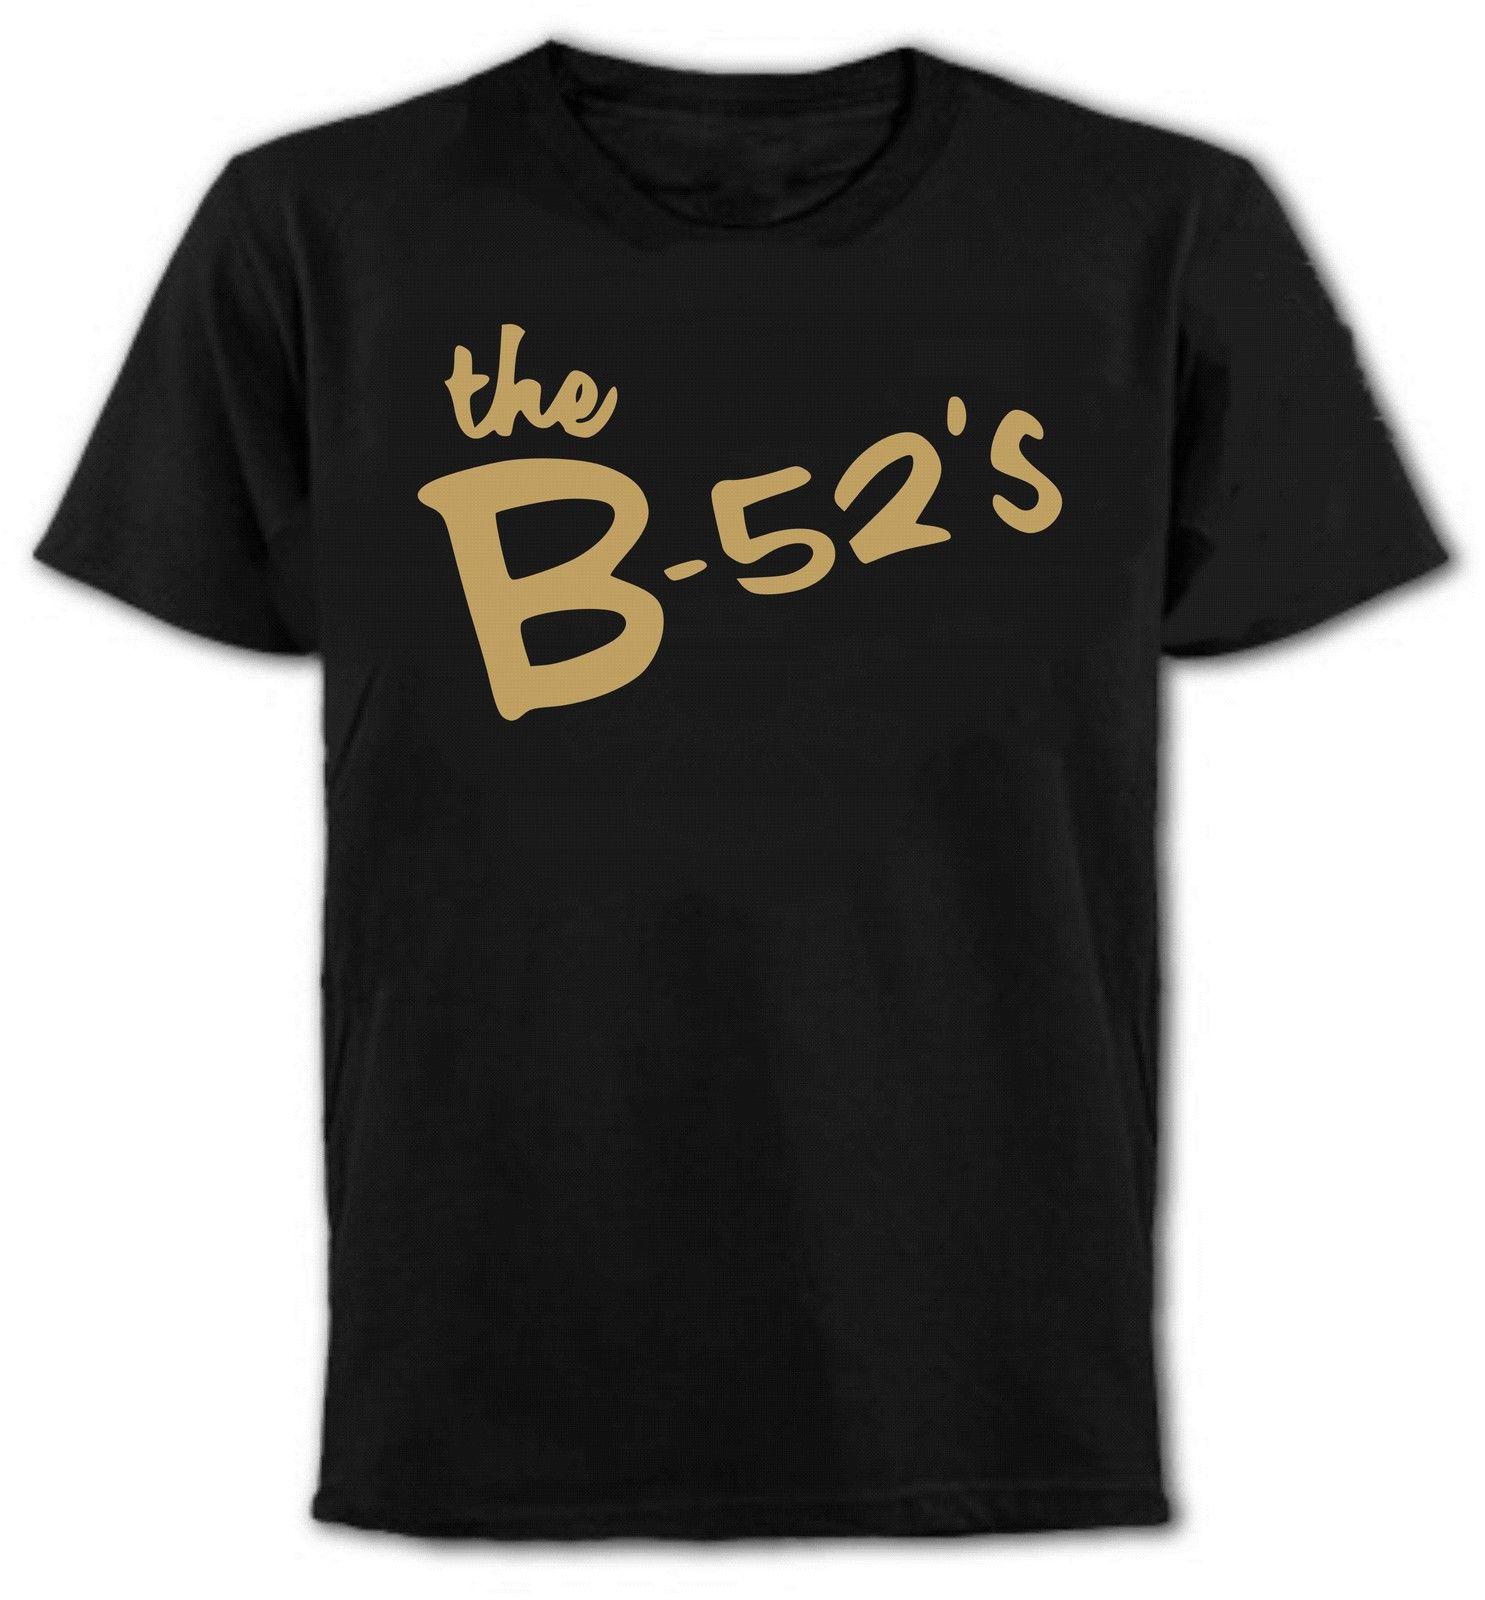 Latest hot cool El B-52S Logo Camiseta-Post Punk Pop Roca-Todas Las Tallas & Colores Design Mens Summer Short Sleeve Tee